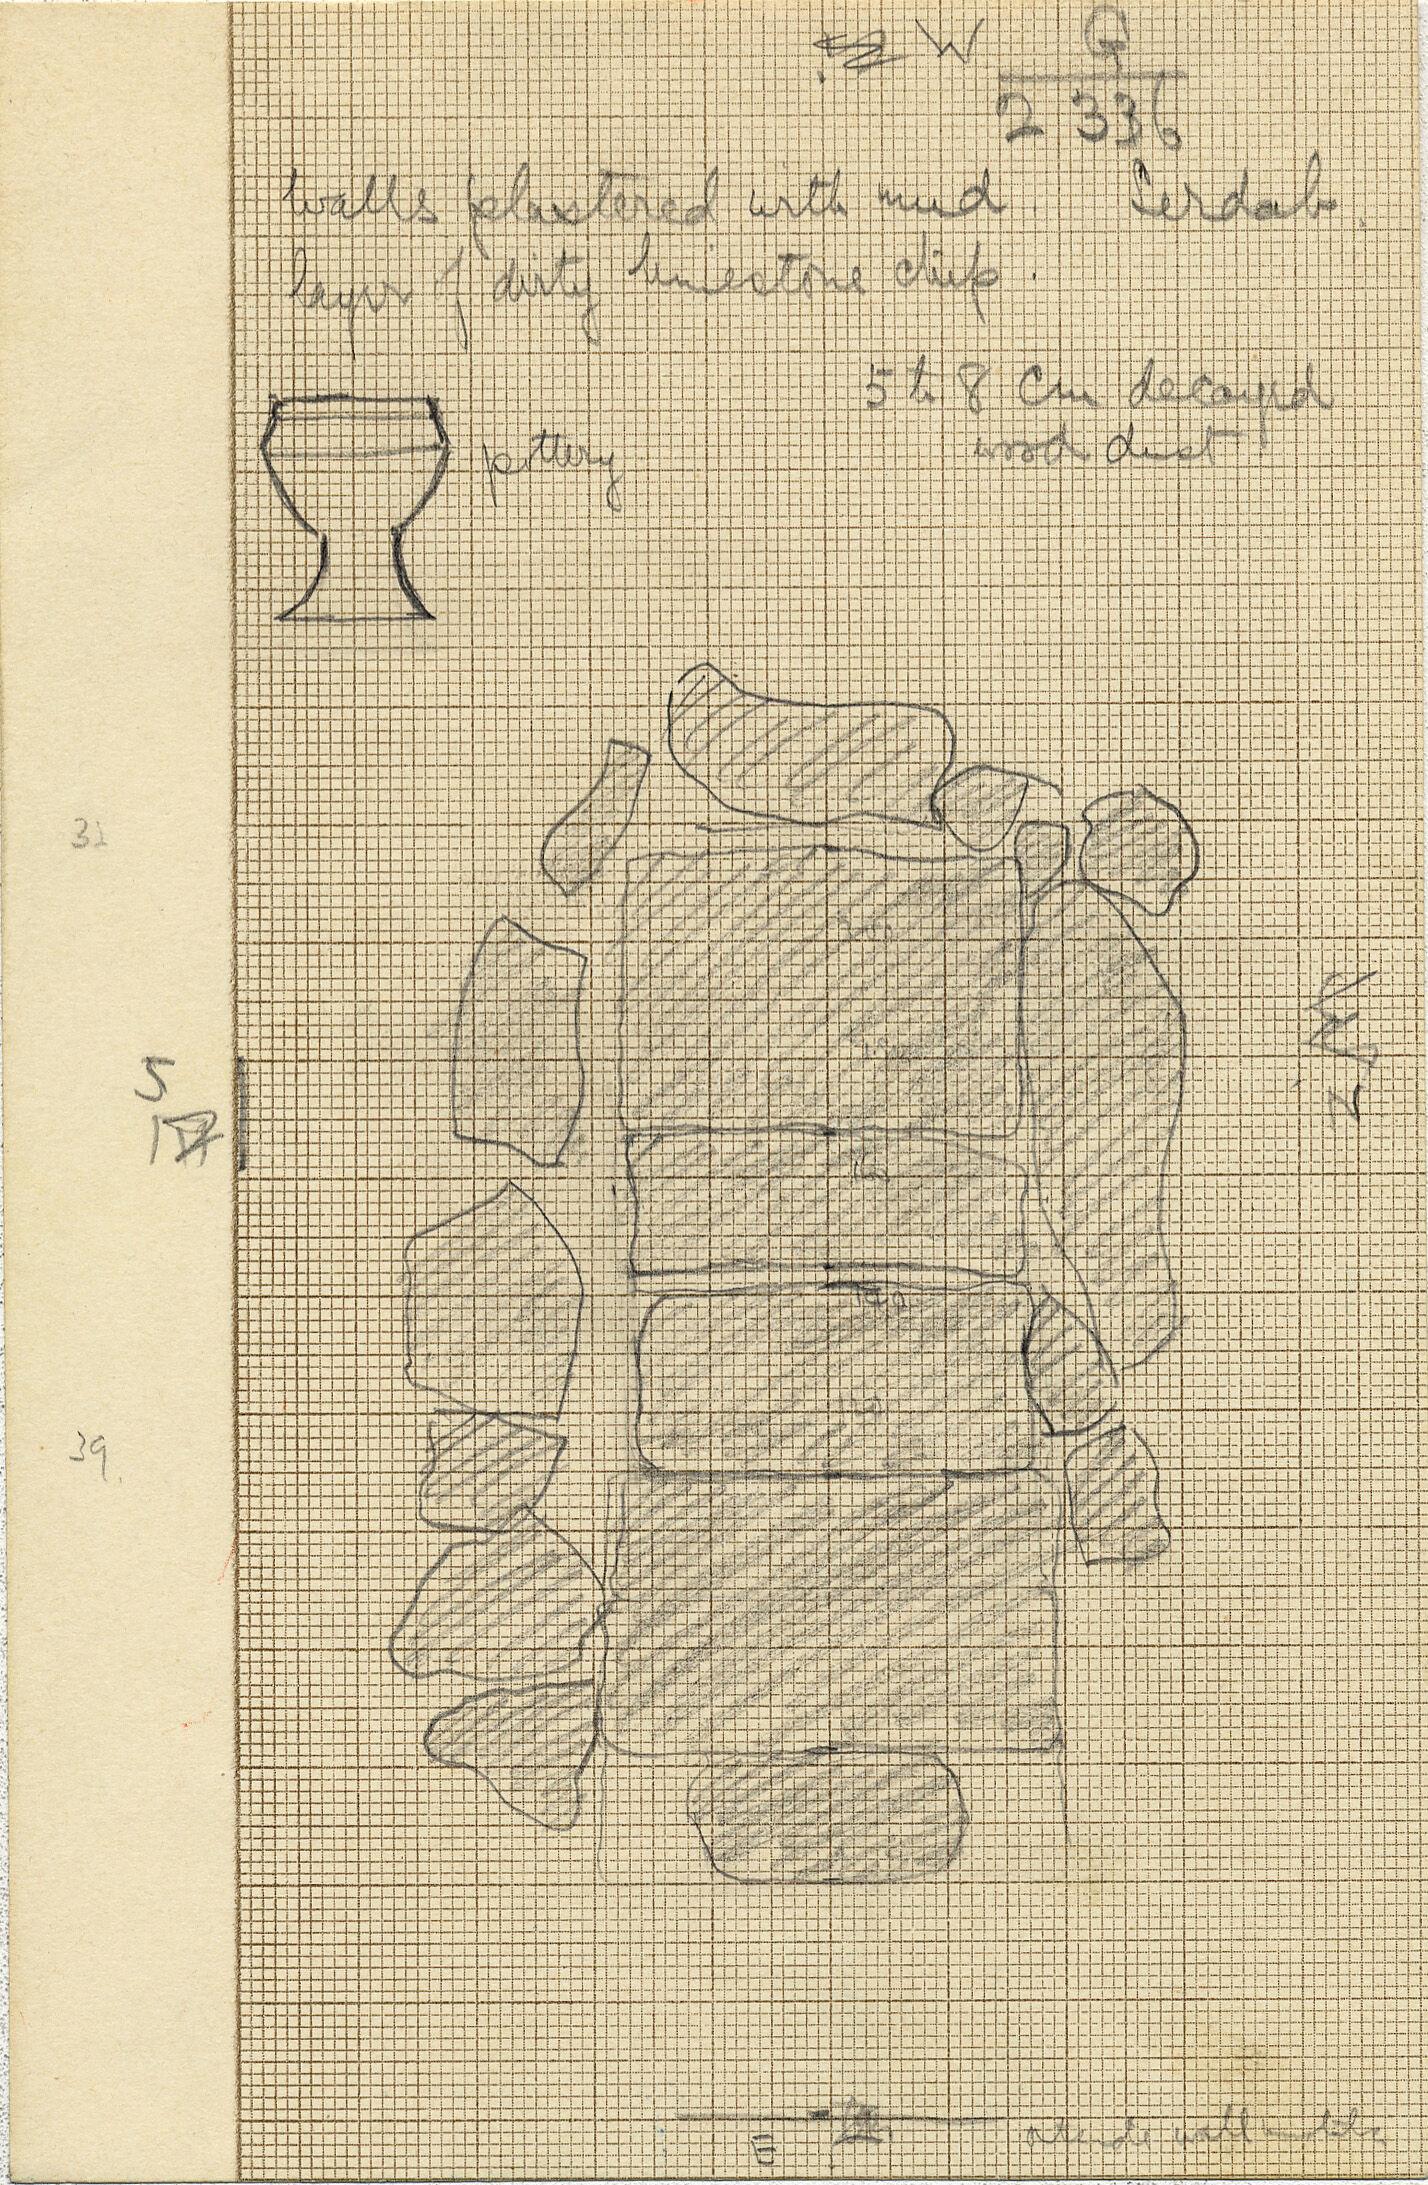 Maps and plans: G 2336, Serdab 1